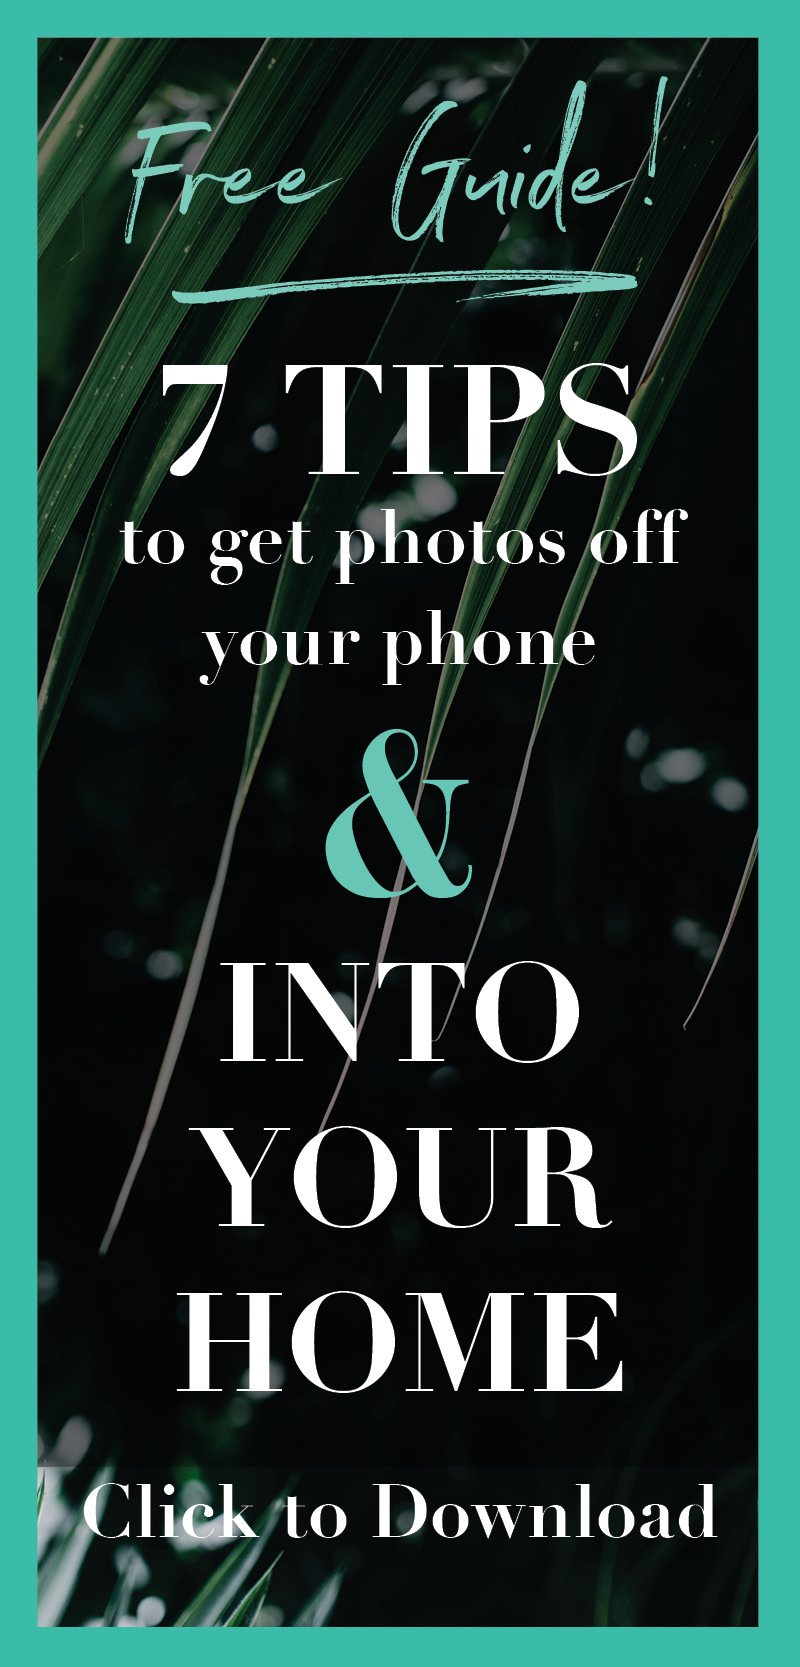 opt-in-7-tips-photos-in-home.jpg